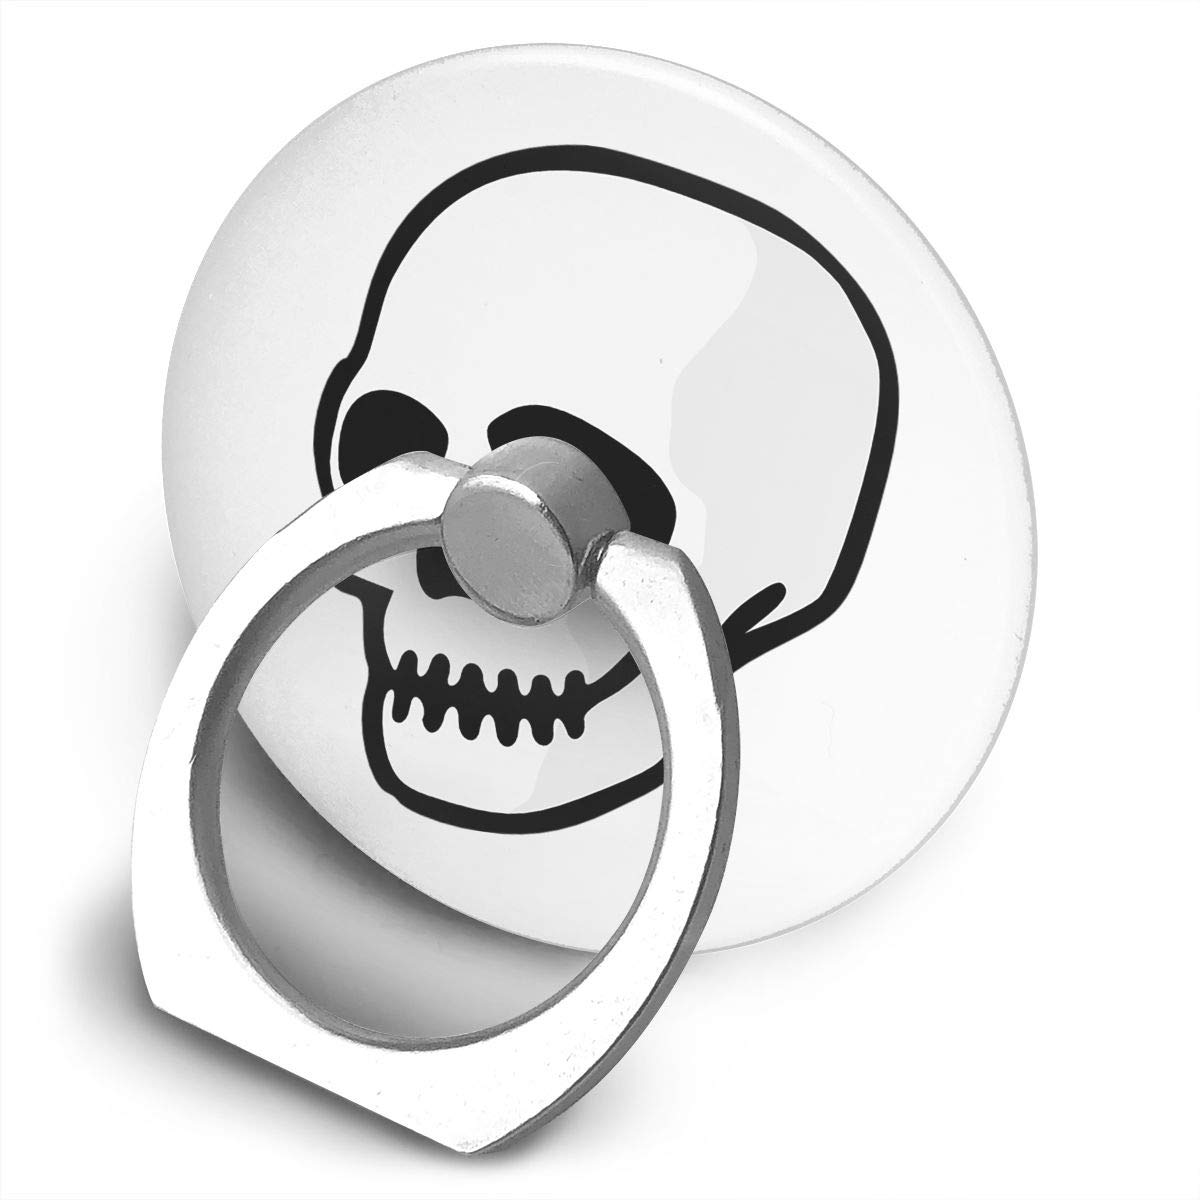 Yuotry 360 Degree Rotating Ring Stand Grip Mounts Sugar Skull Universal Phone Ring Bracket Holder Smartphone Ring Stent